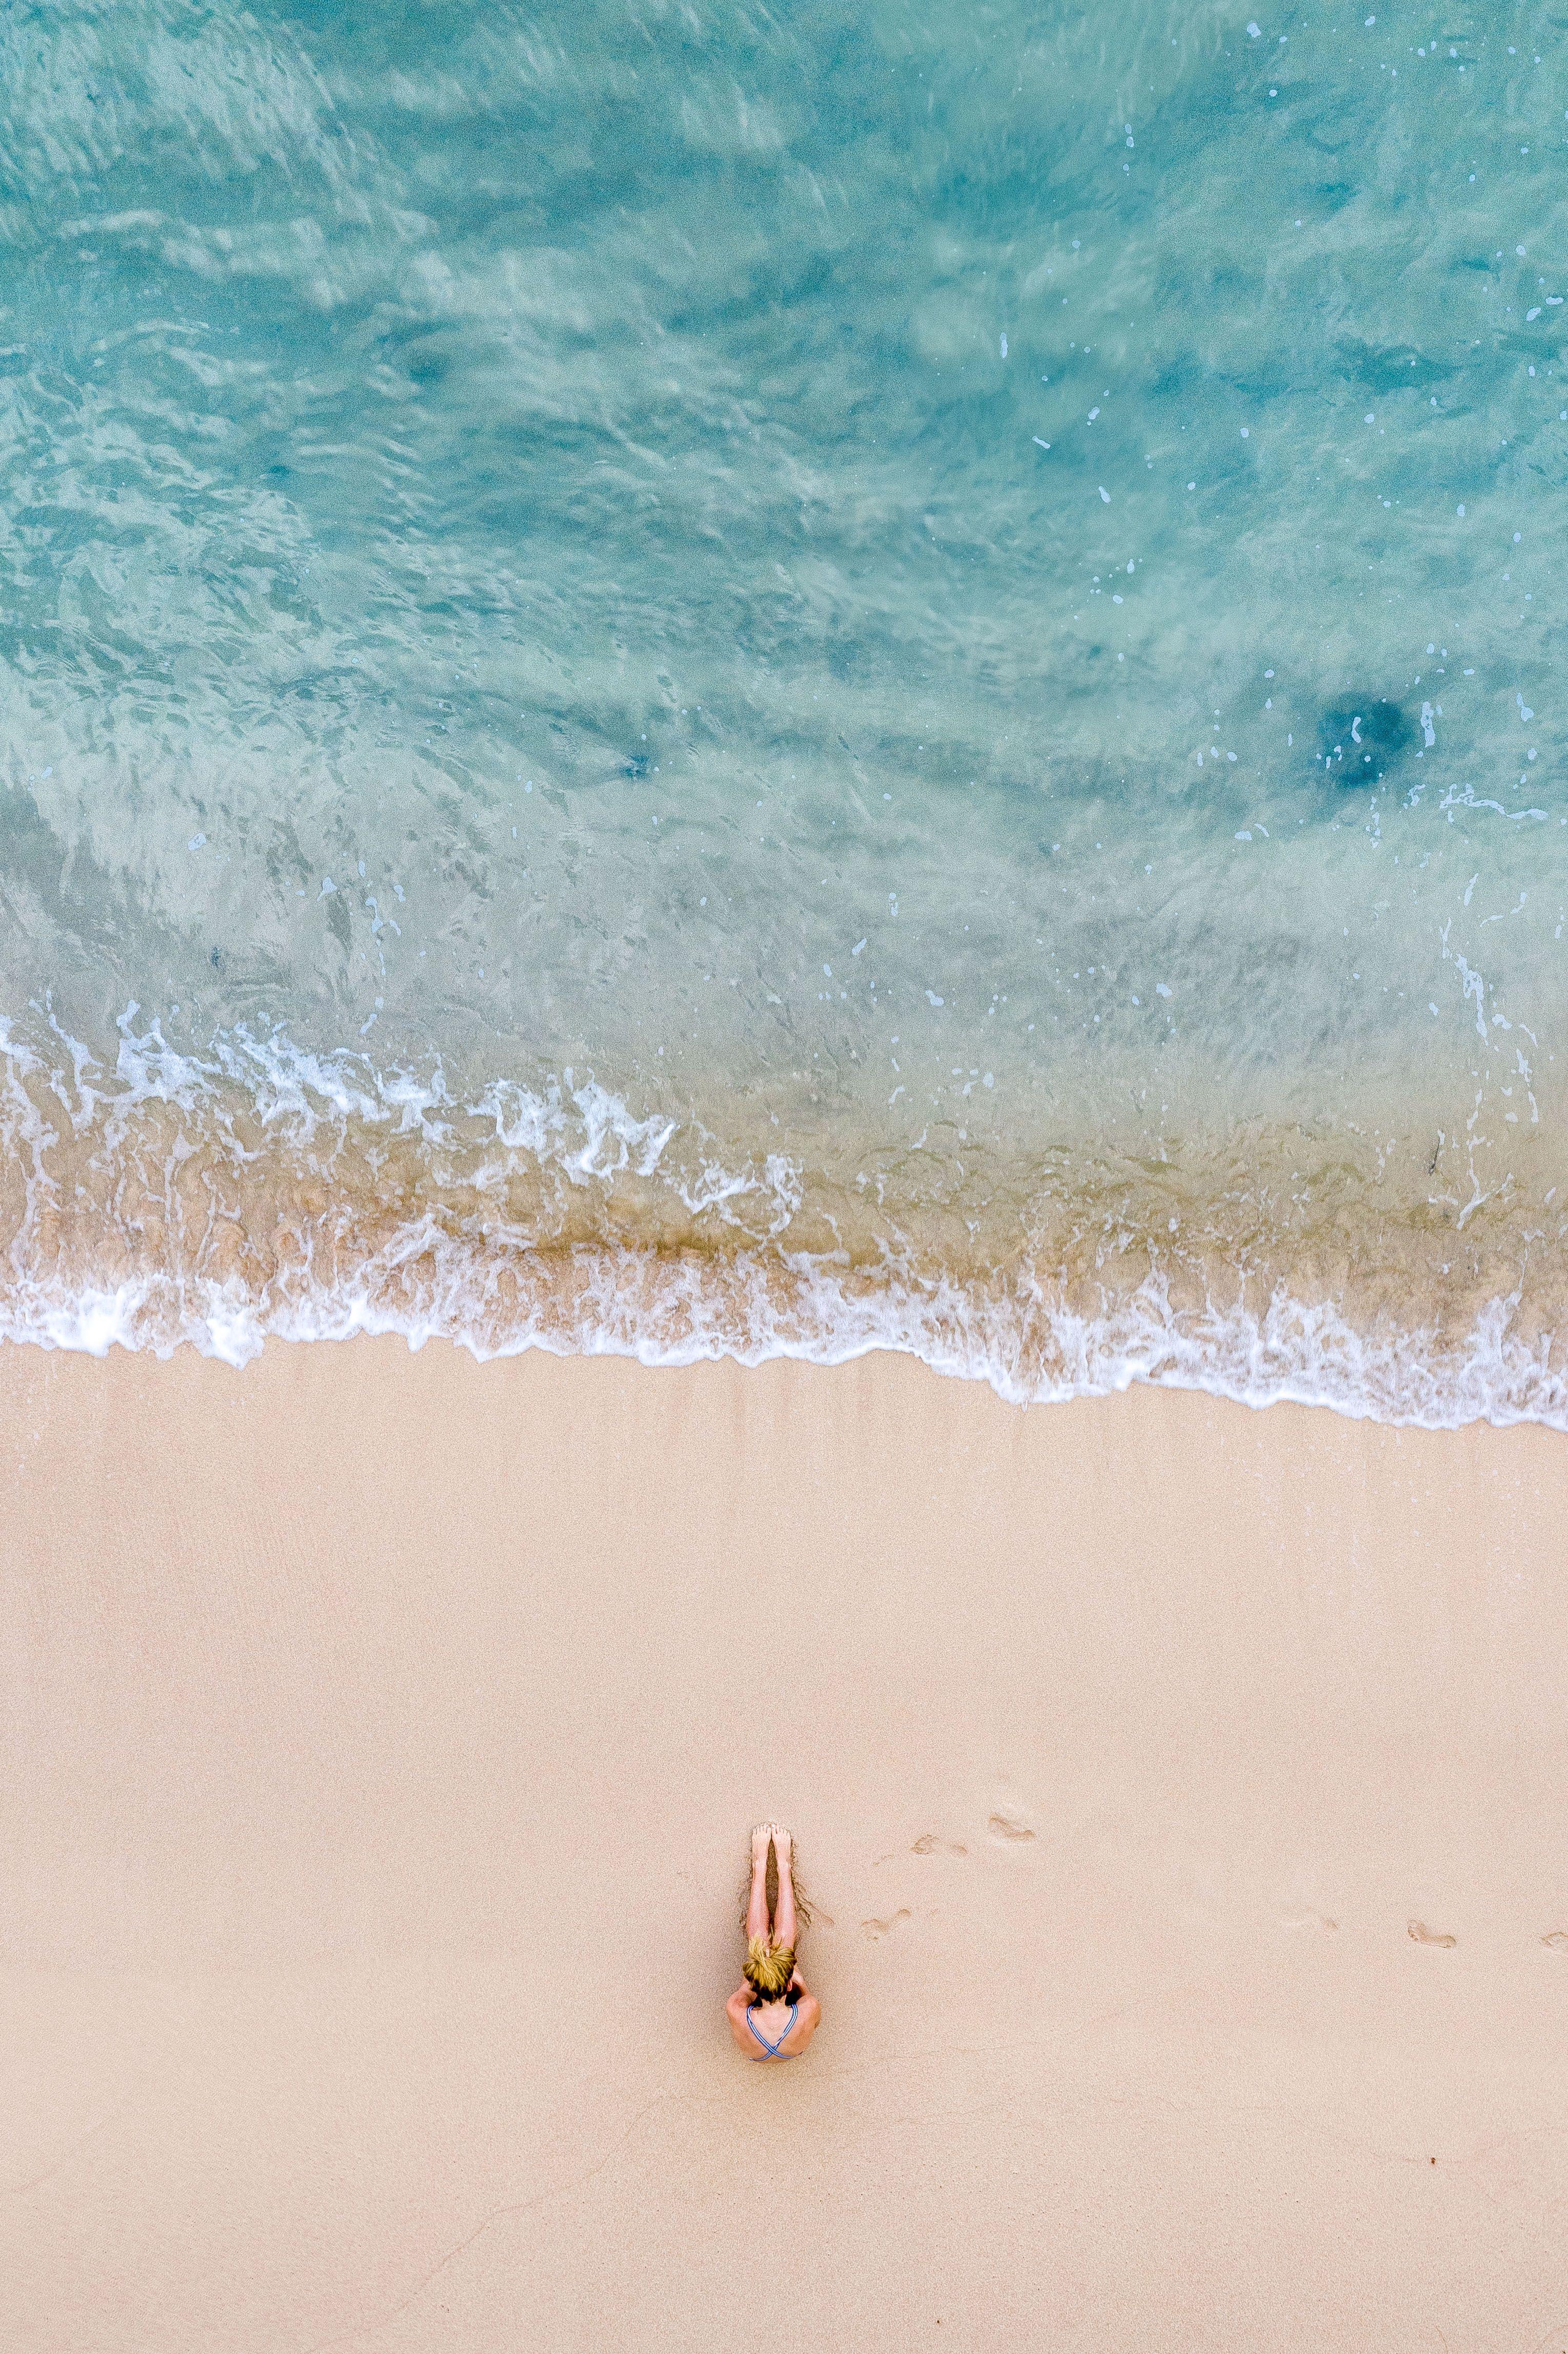 Drone Selfie Aerial Beach Photography Aerial Photography Drone Beach Drone Photography